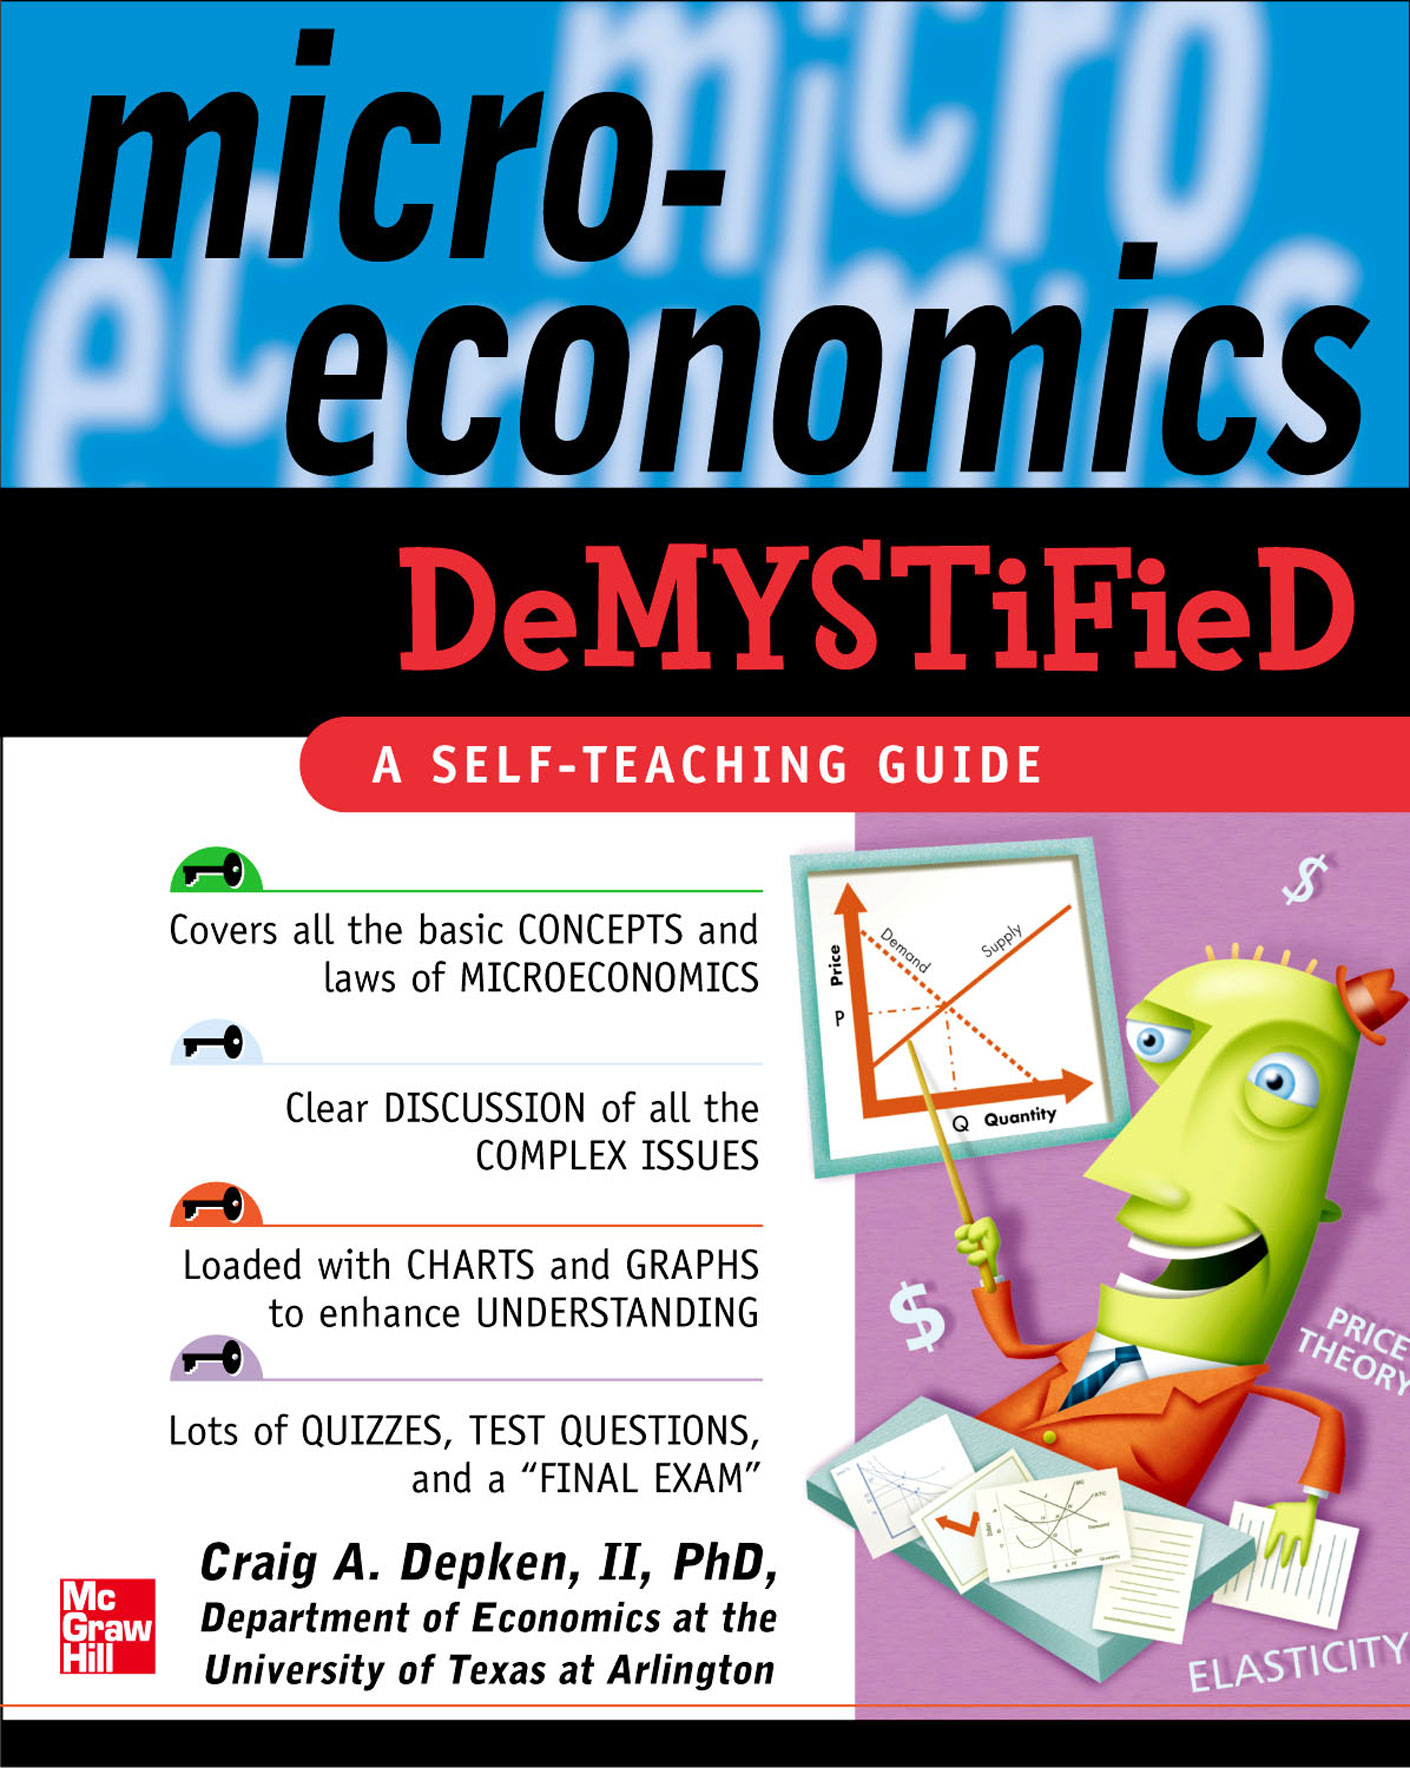 Download Ebook Microeconomics Demystified by Craig Depken Pdf